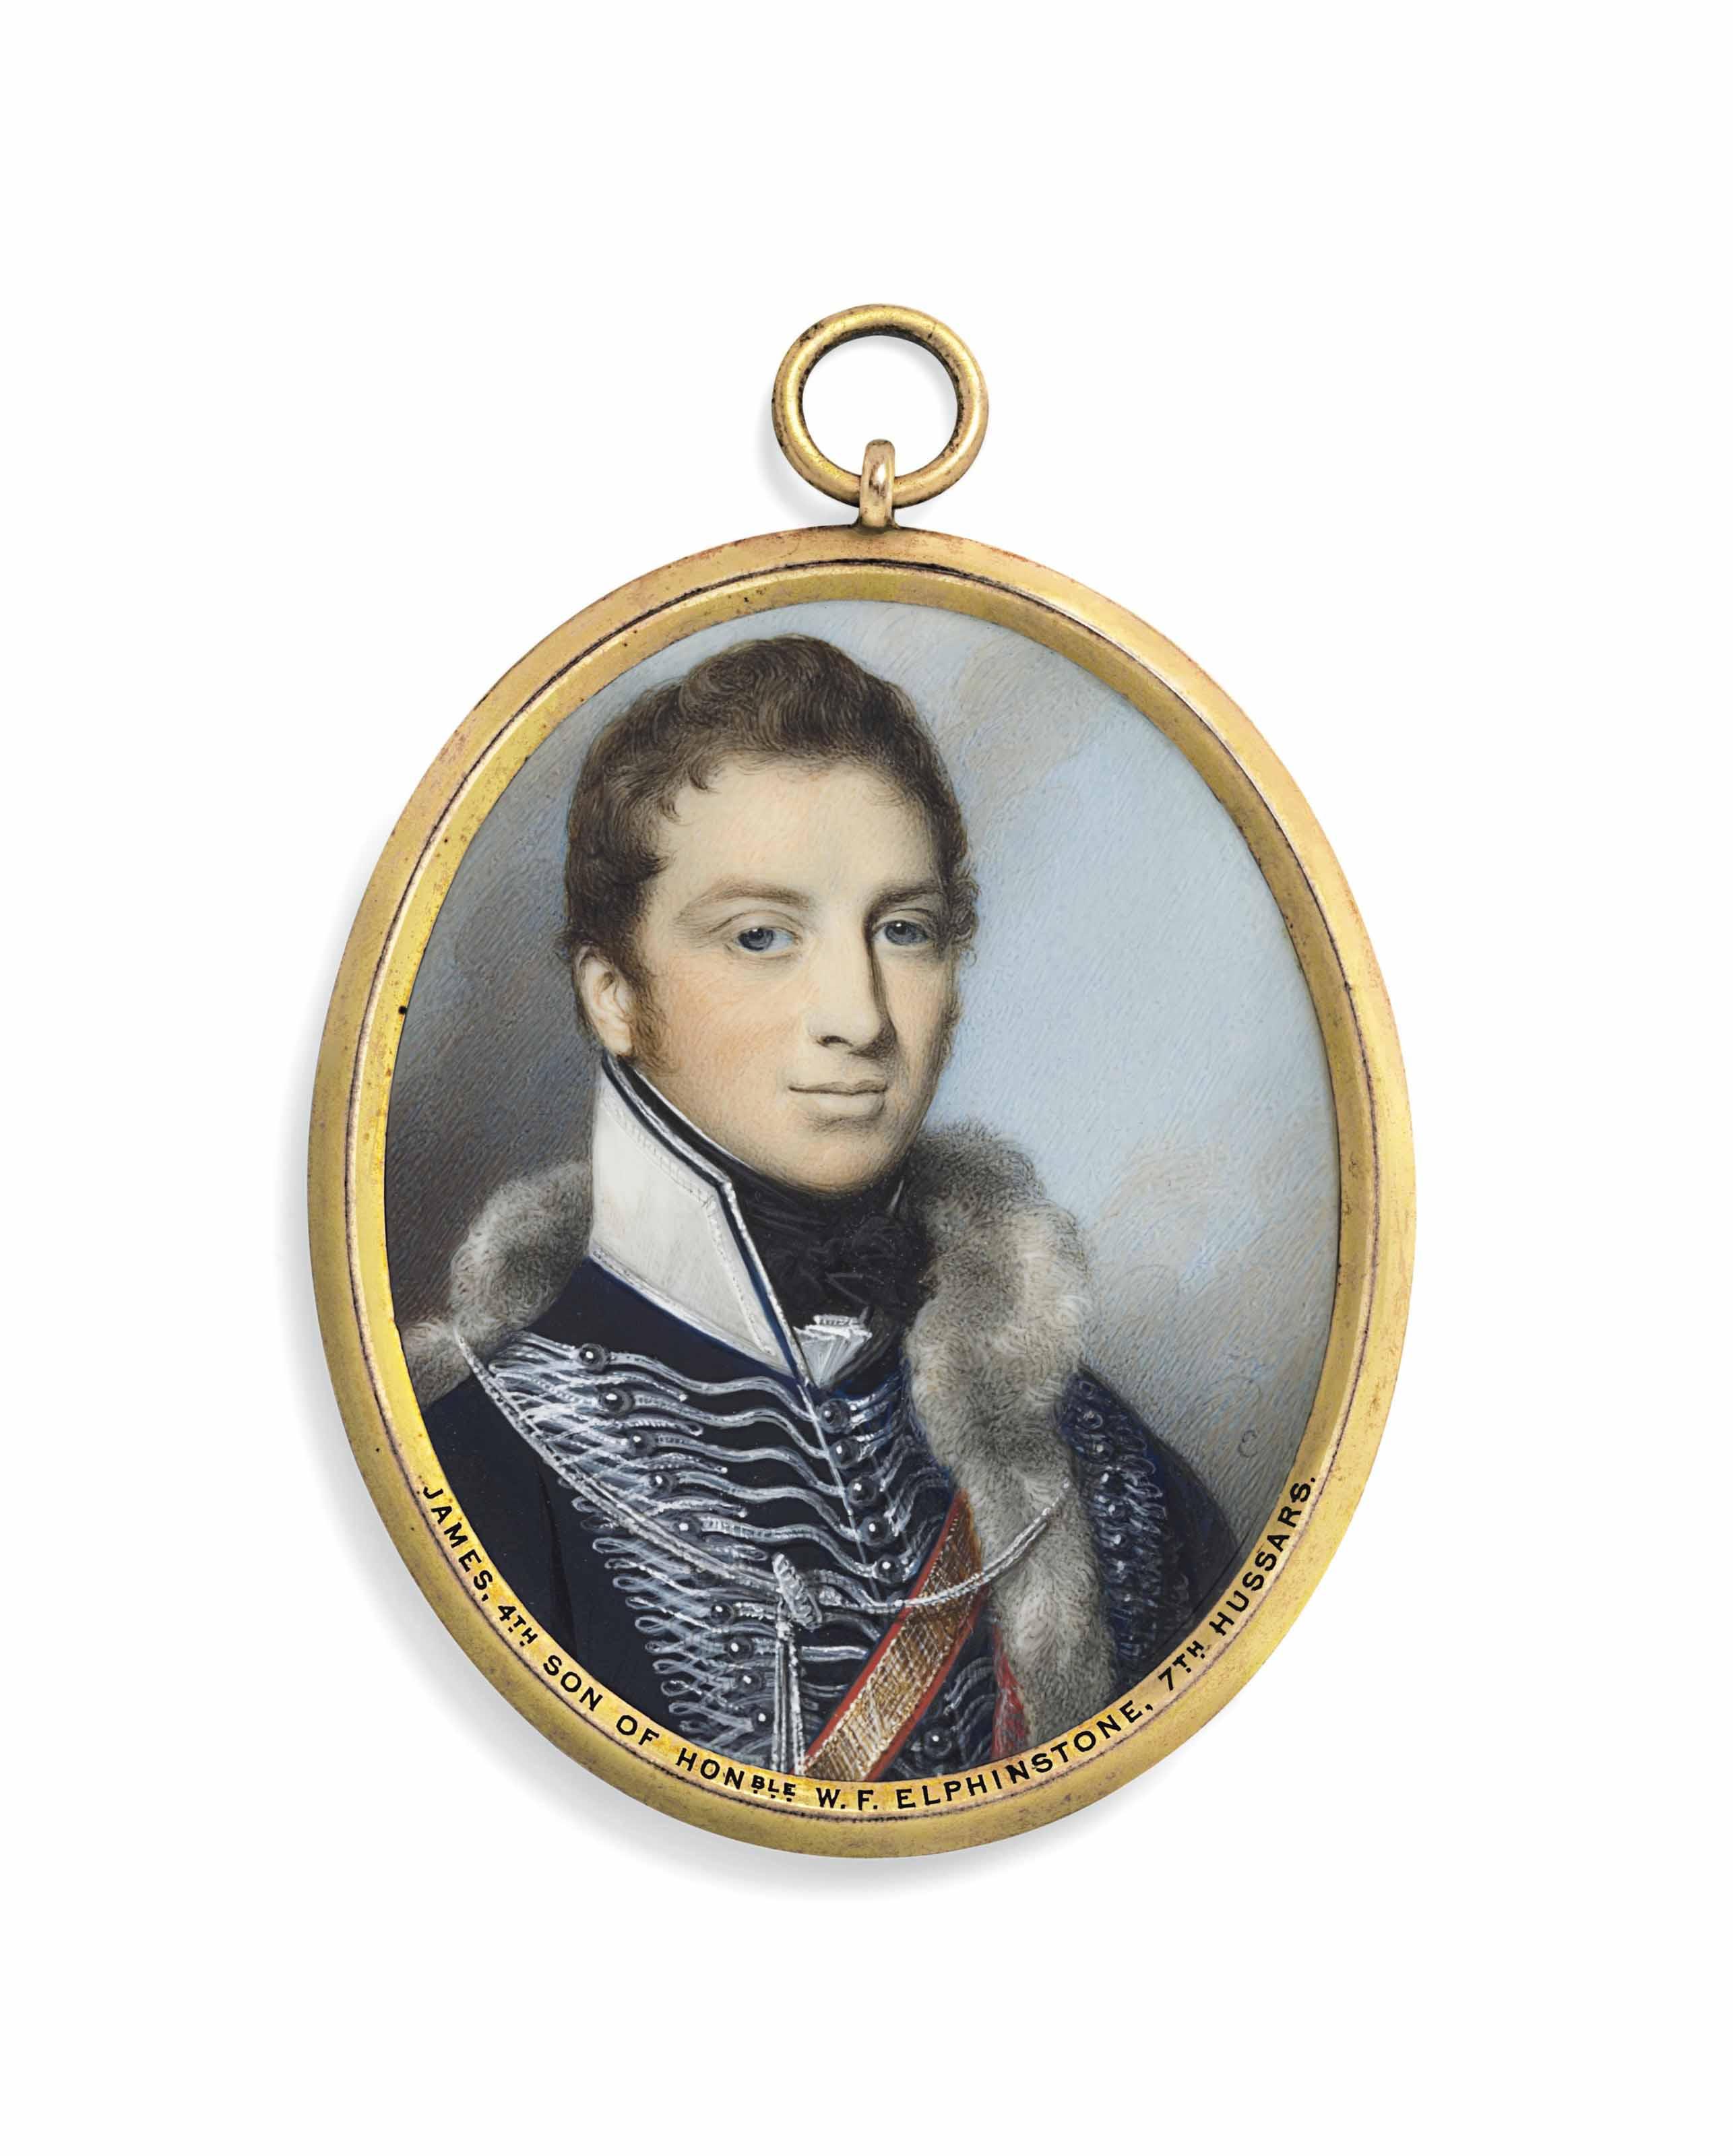 GEORGE ENGLEHEART (BRITISH, 1750/1753 - 1829)